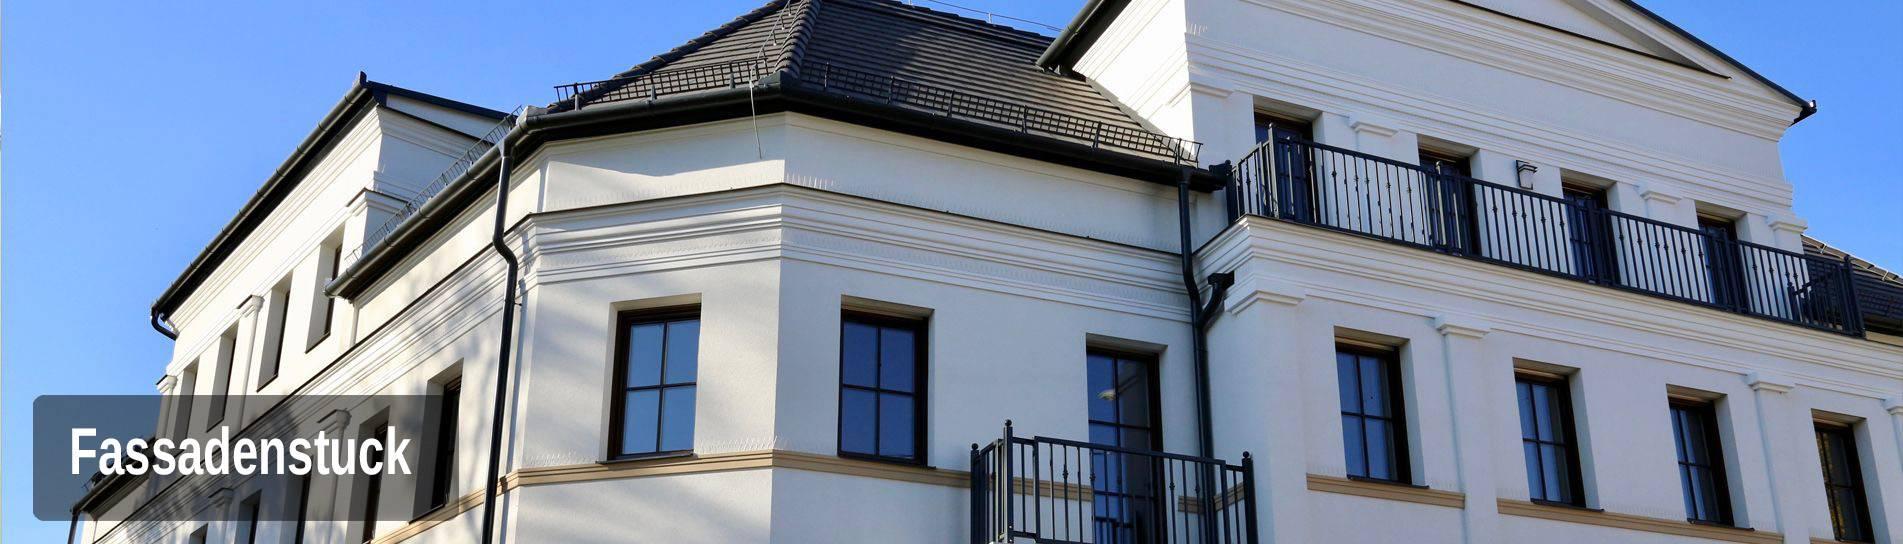 Fassadengestaltung mit Styroporstuck